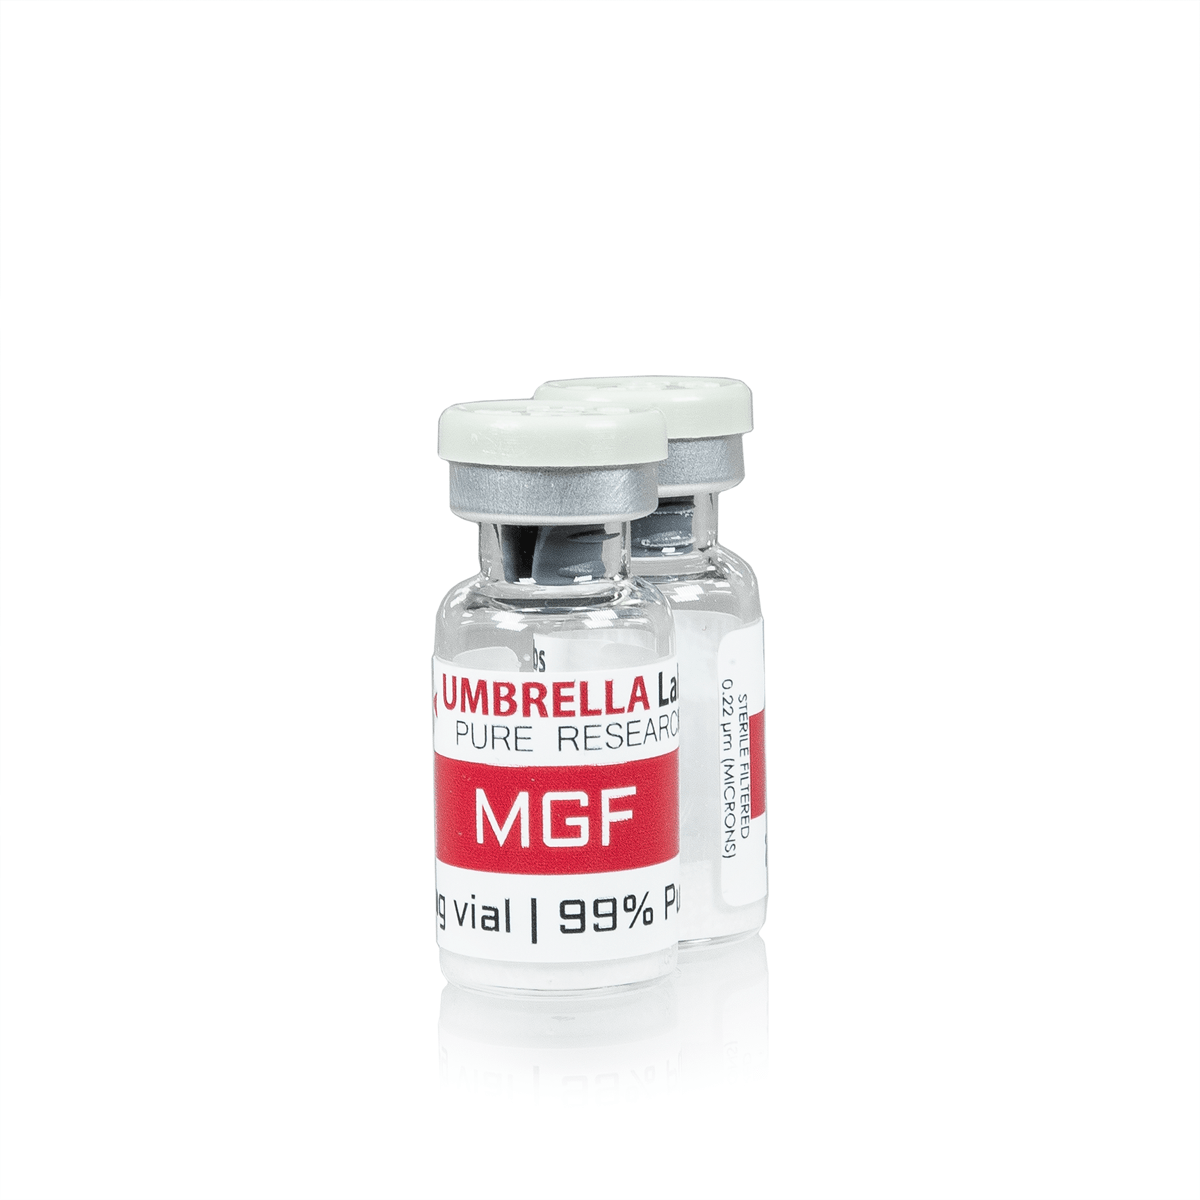 MGF MECHANO GROWTH FACTOR PEPTIDE 2MG VIAL